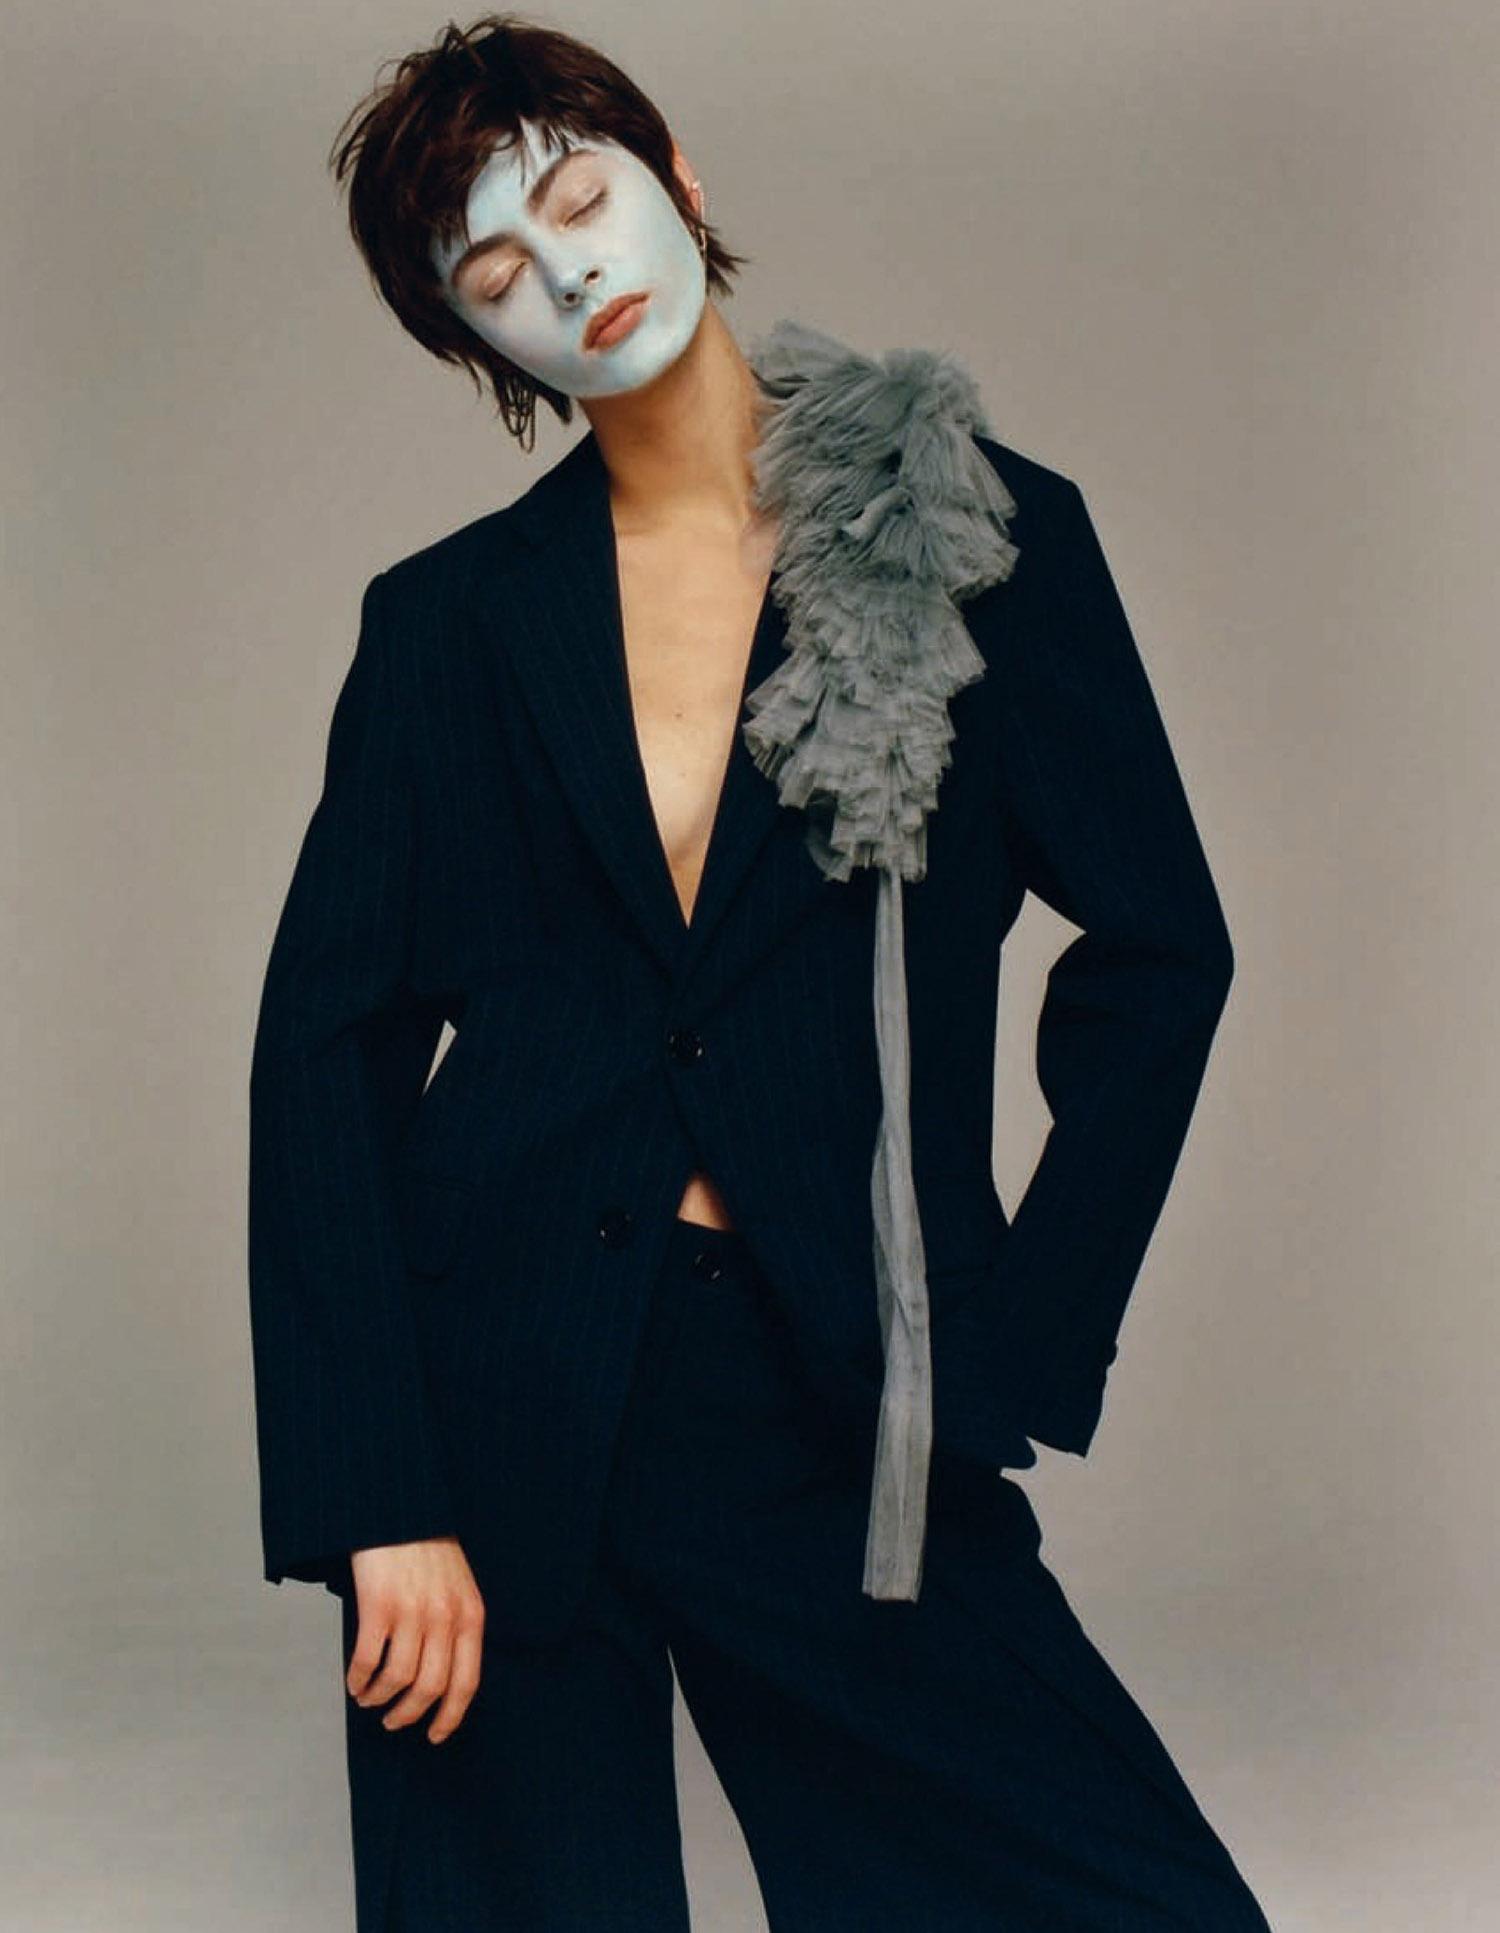 Patrycja Piekarska by Allyssa Heuze for Vogue China January 2021